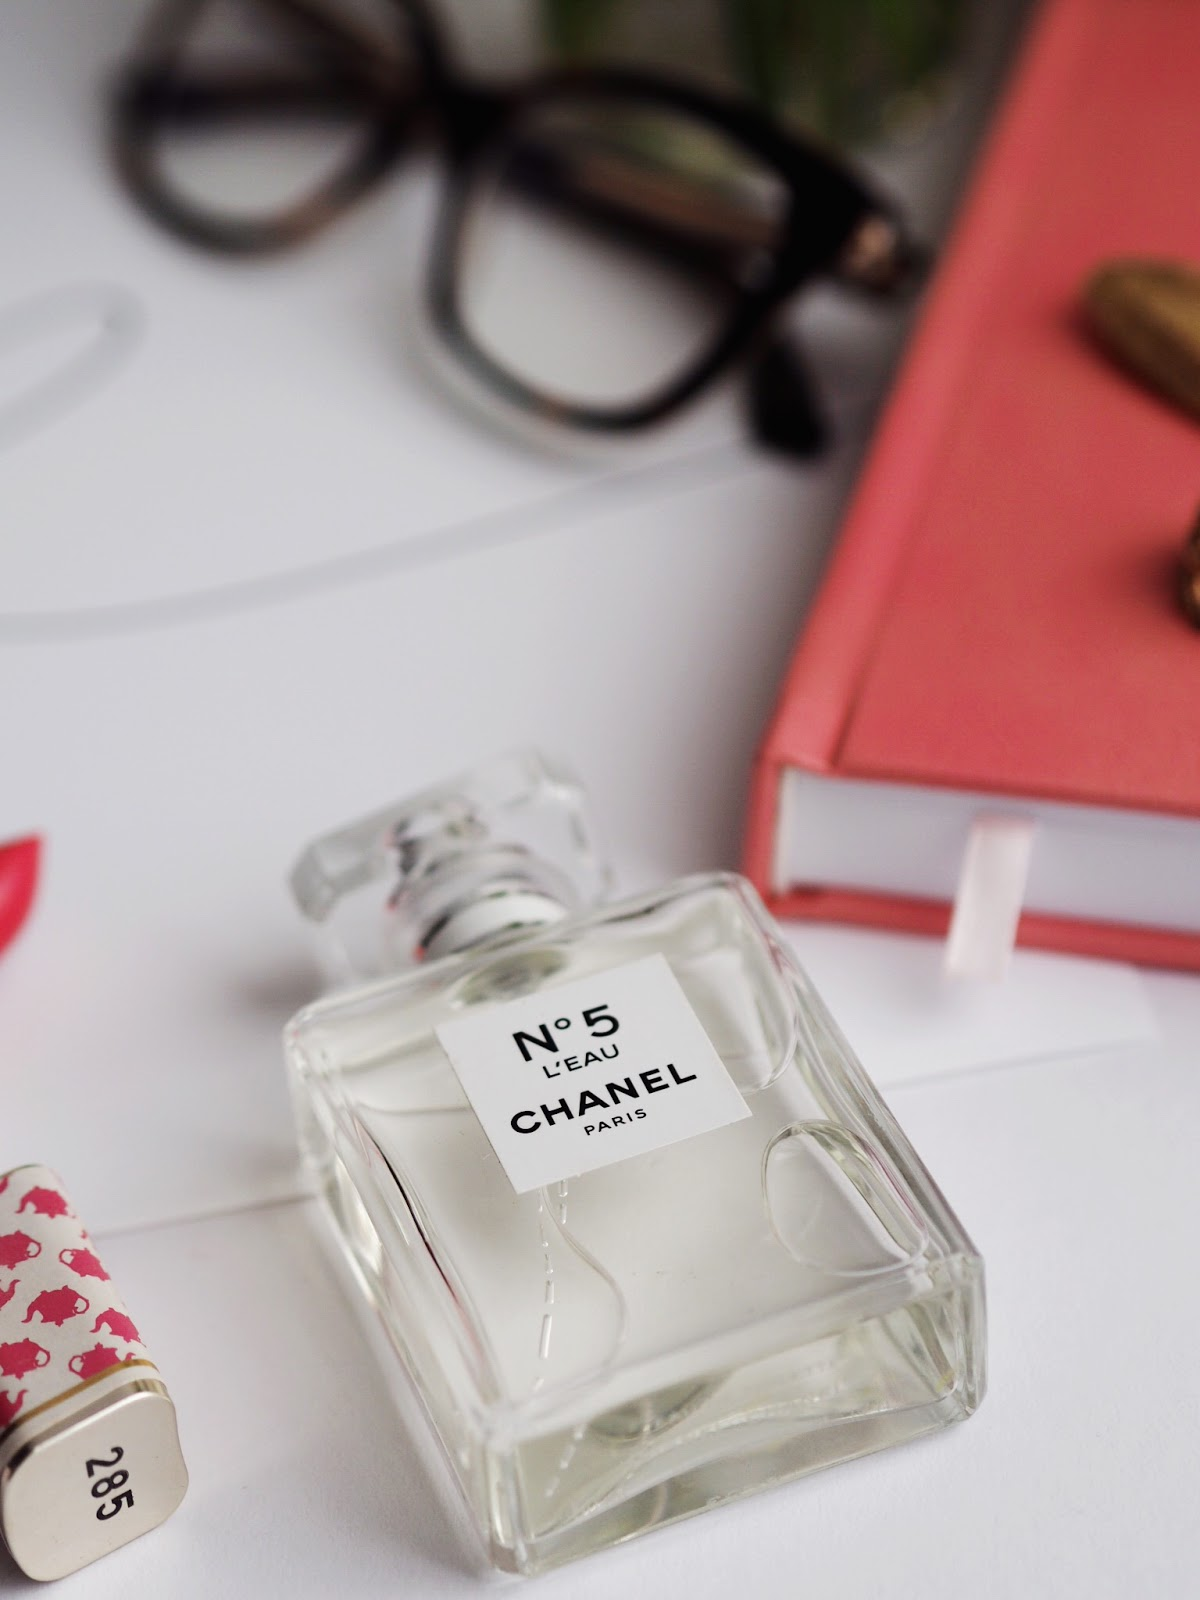 Lifestyle | Defining Success; Chanel L'Eau Perfume